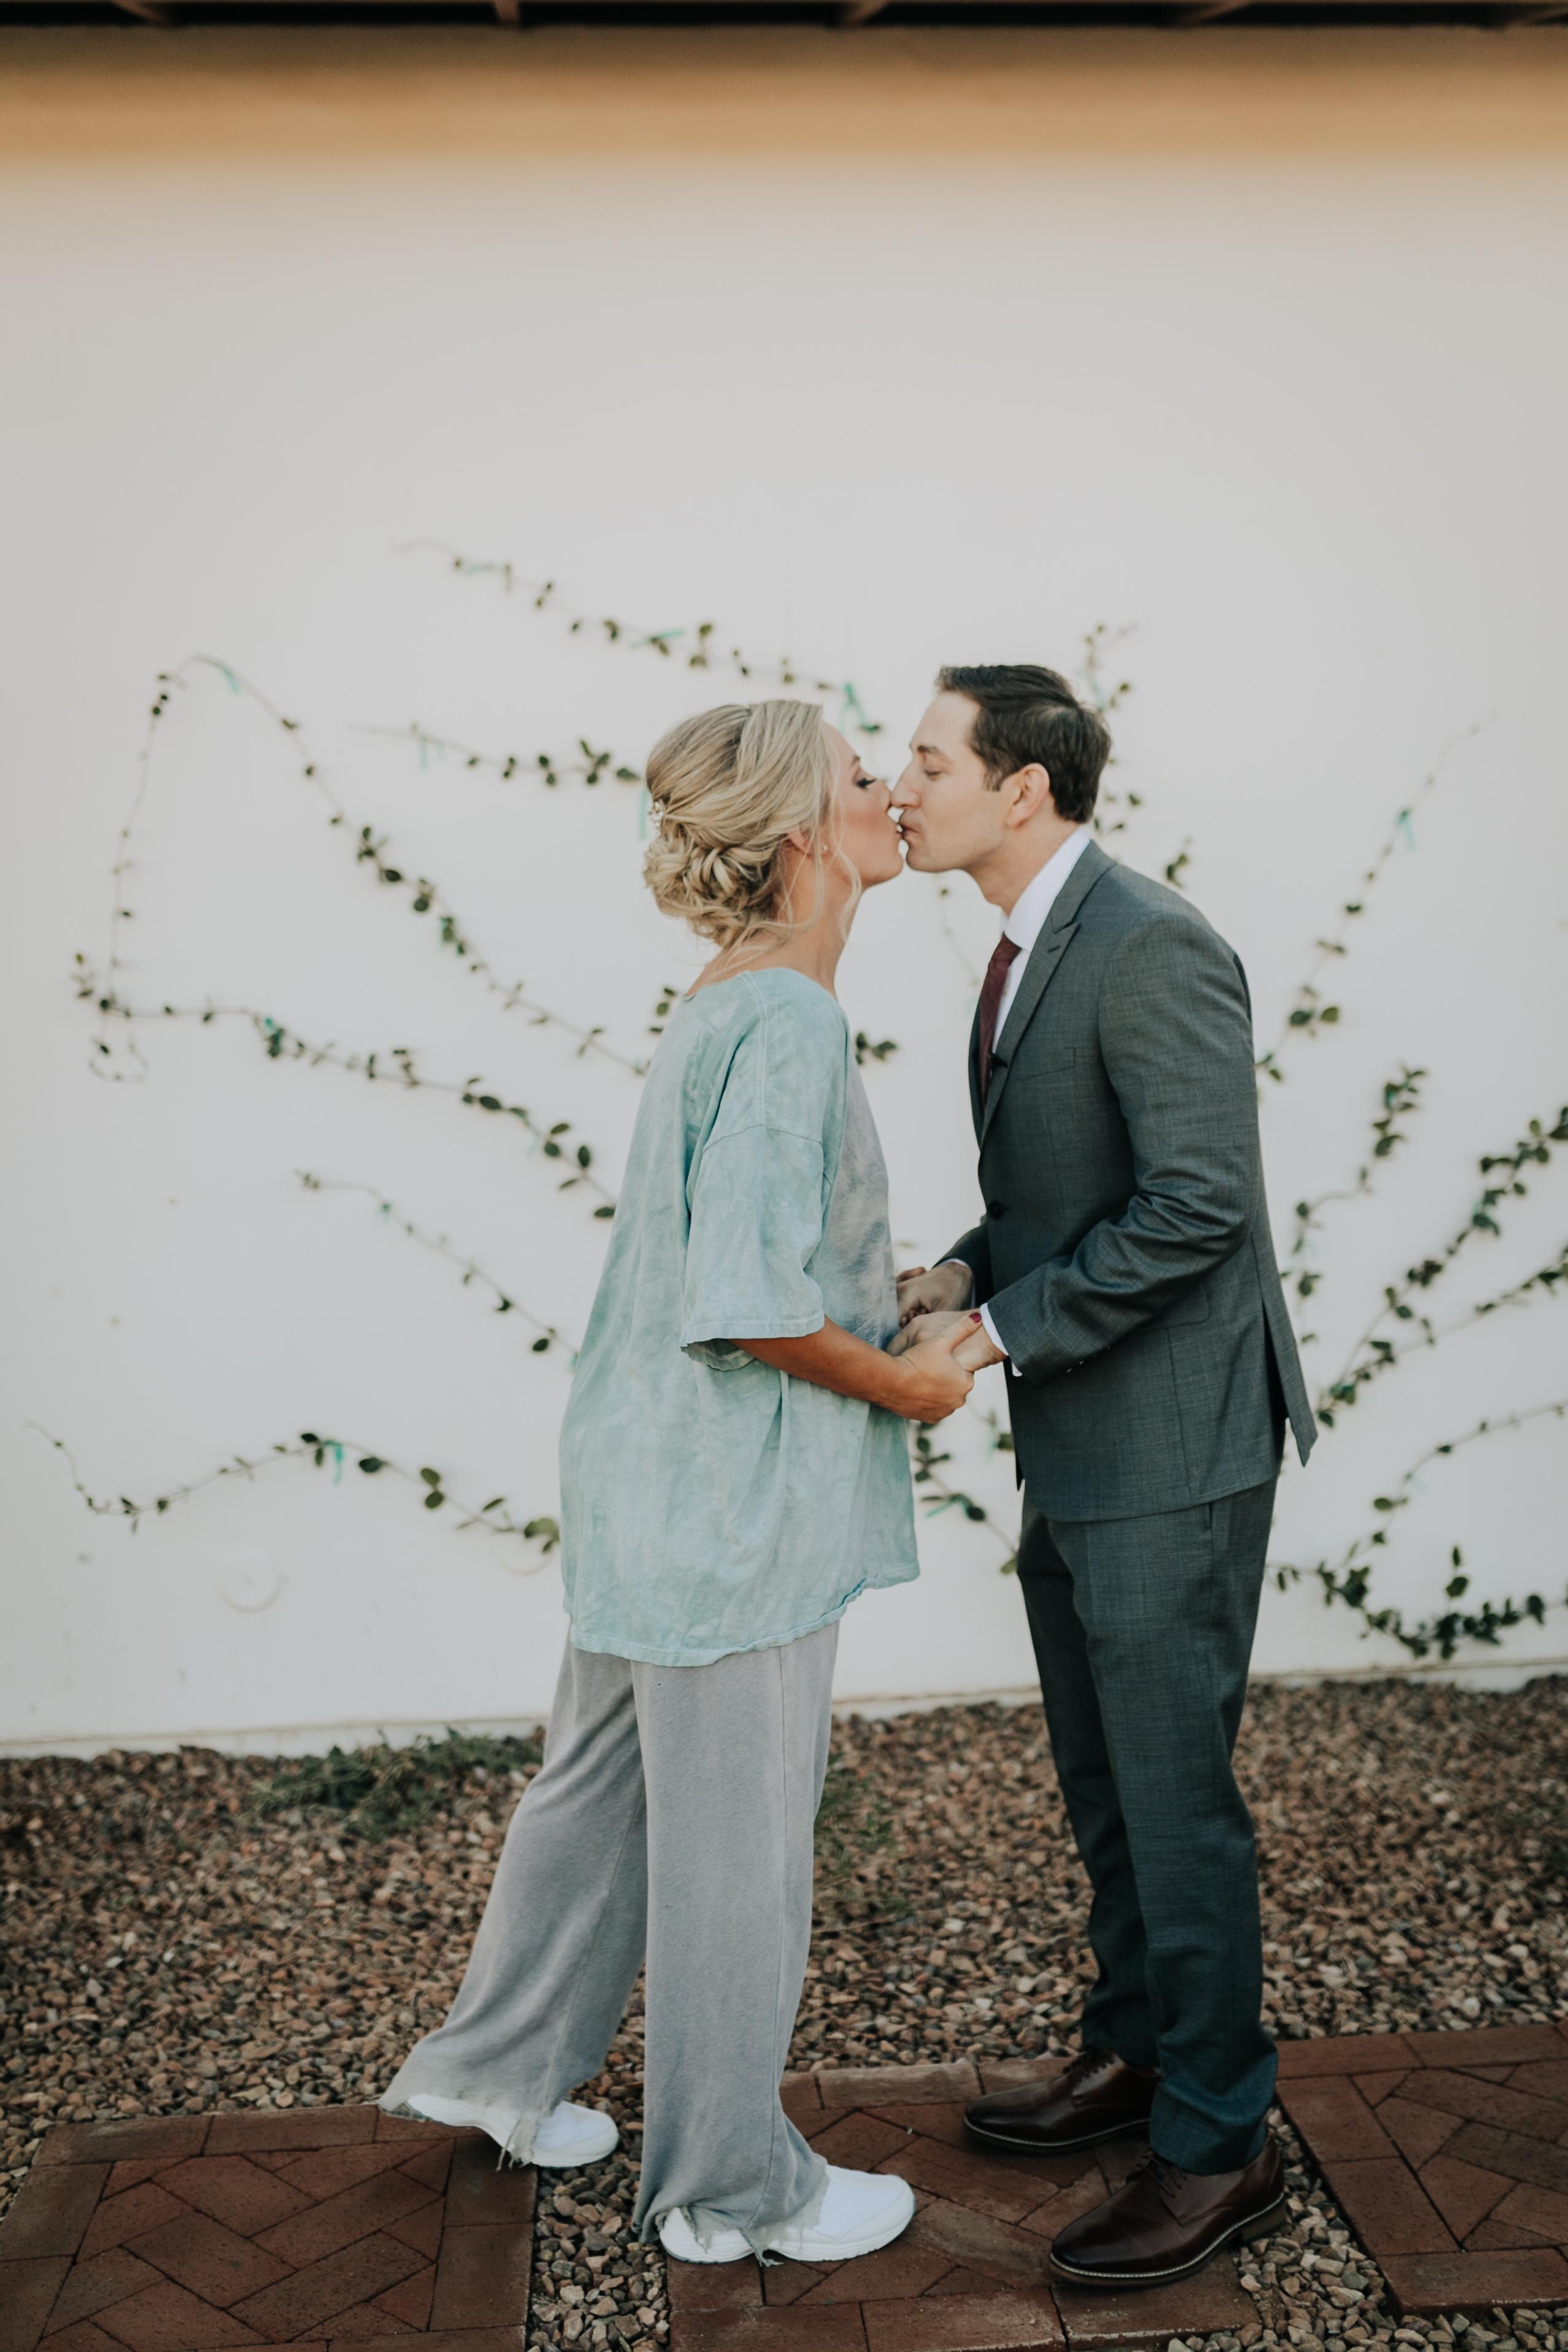 funny wedding photo kiss